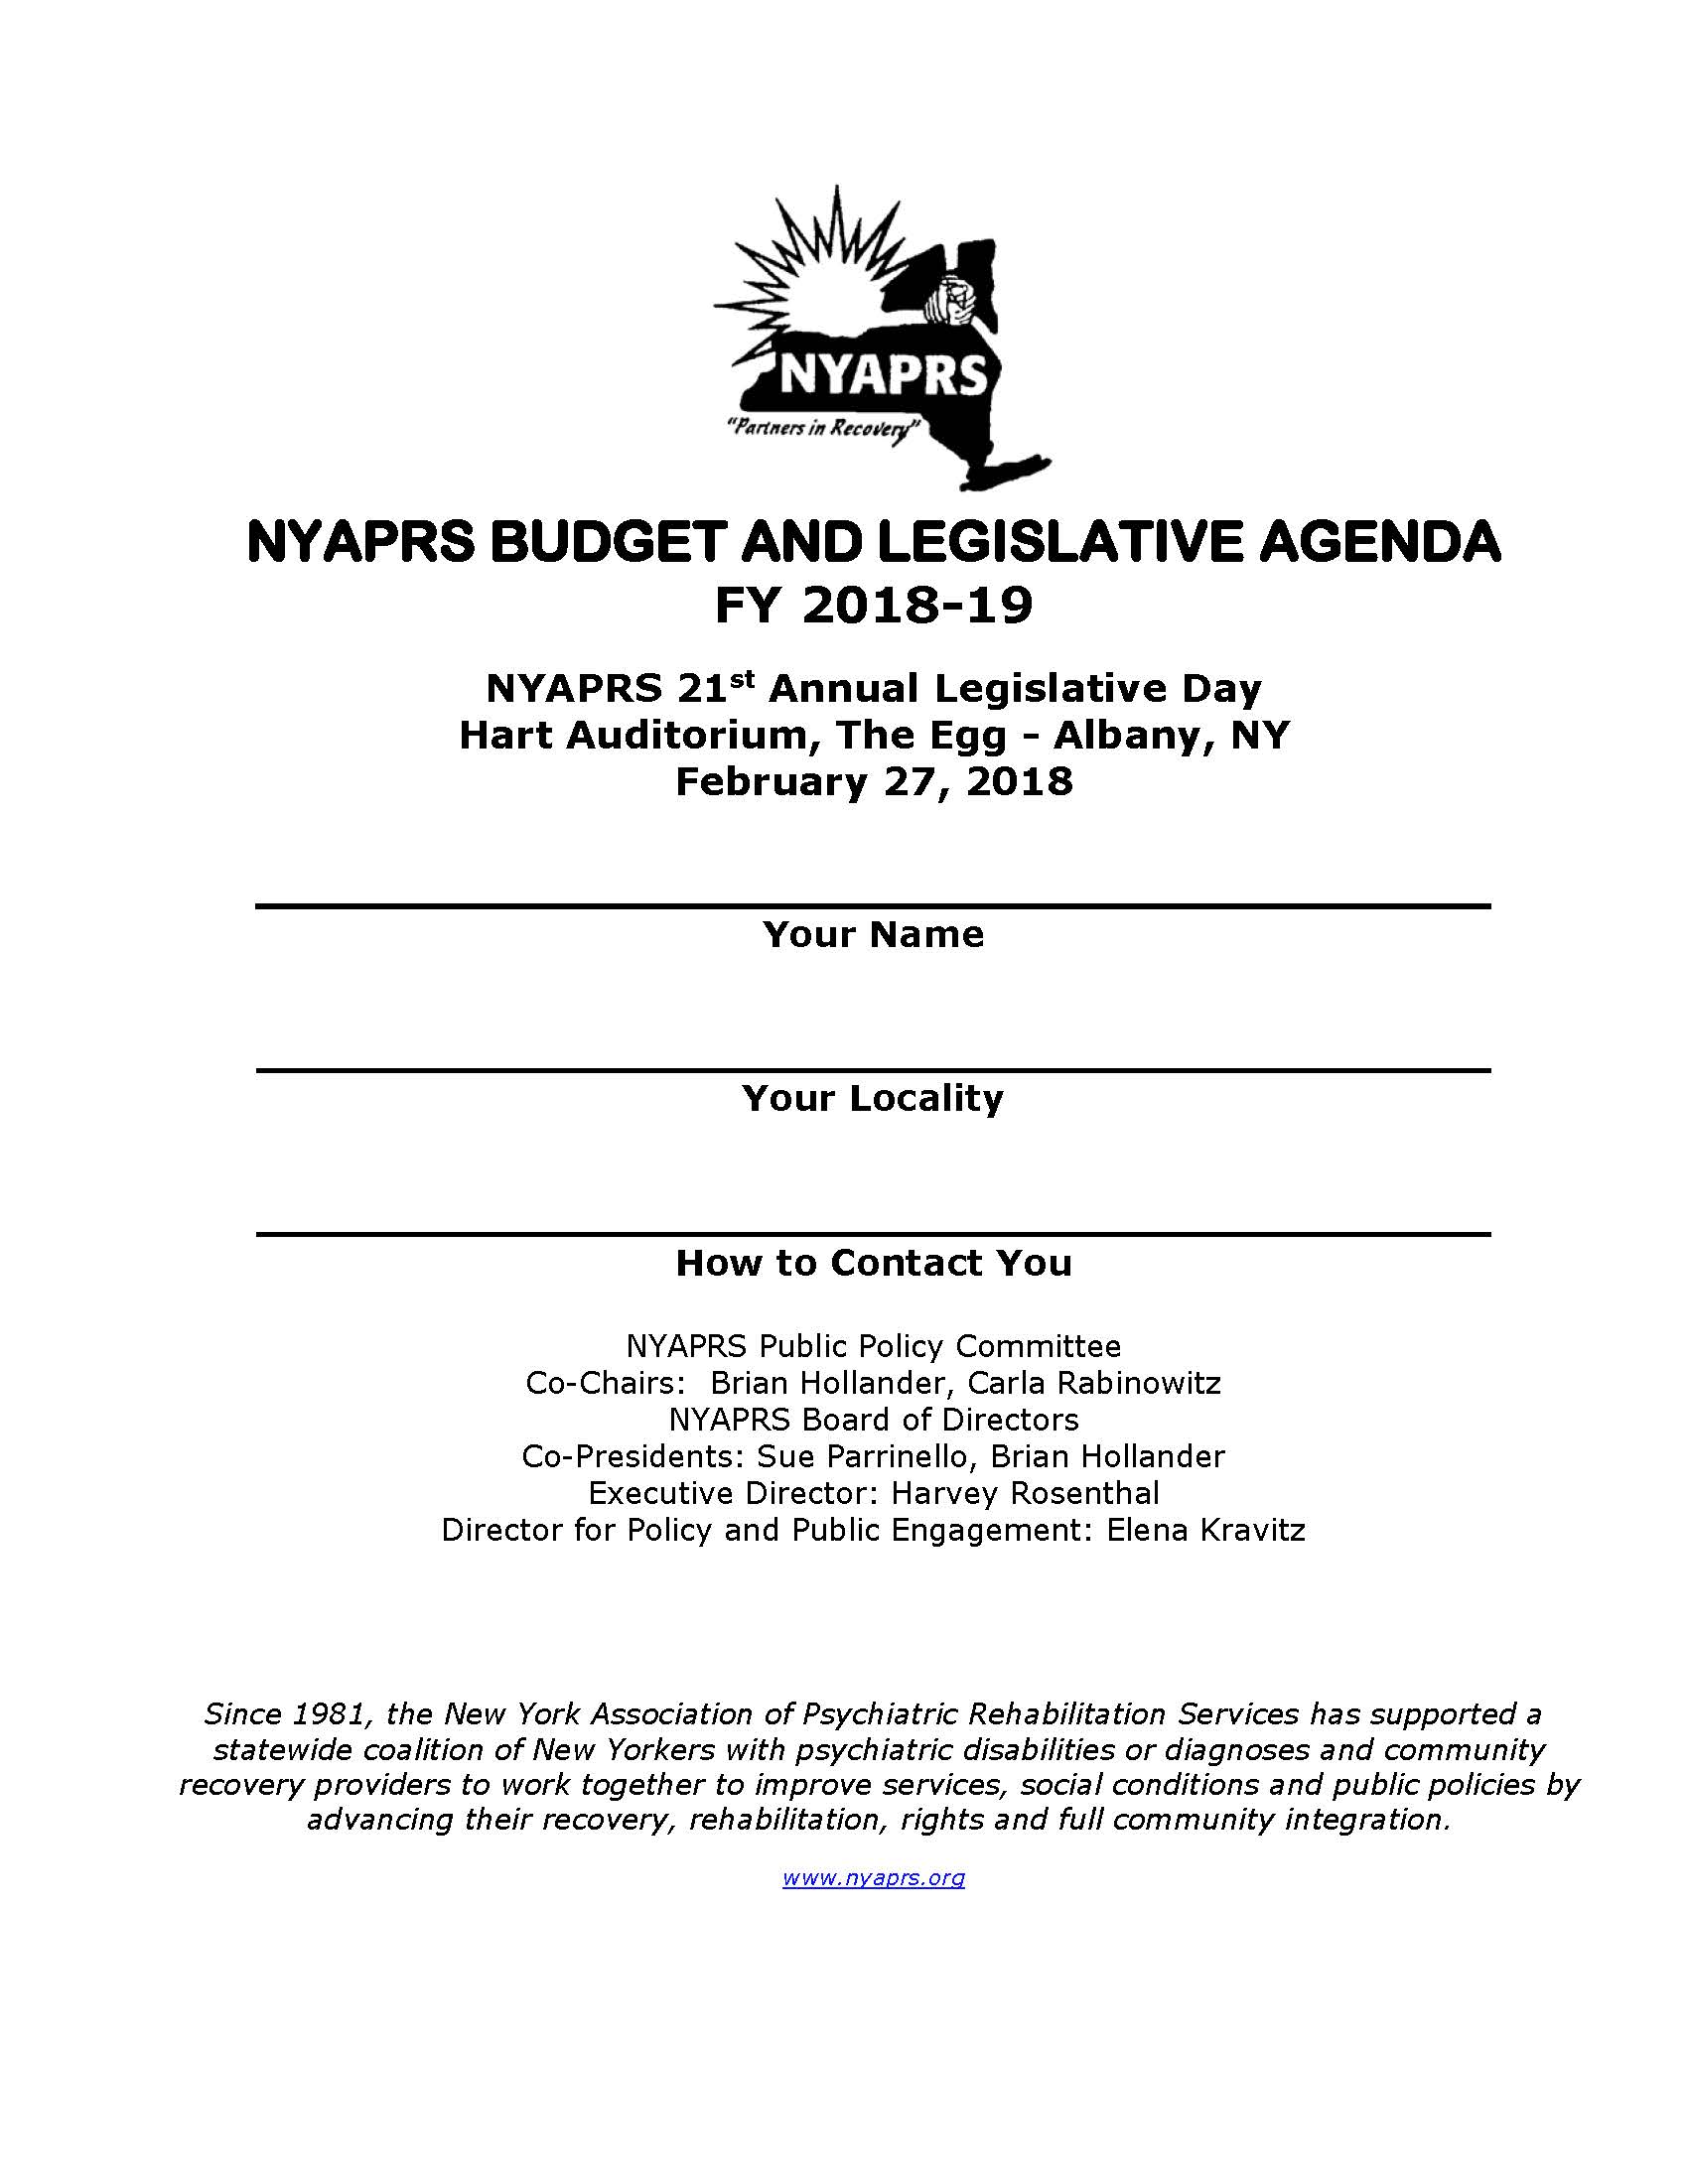 NYAPRS Final 2018 Legislative Day Book_Page_01.jpg